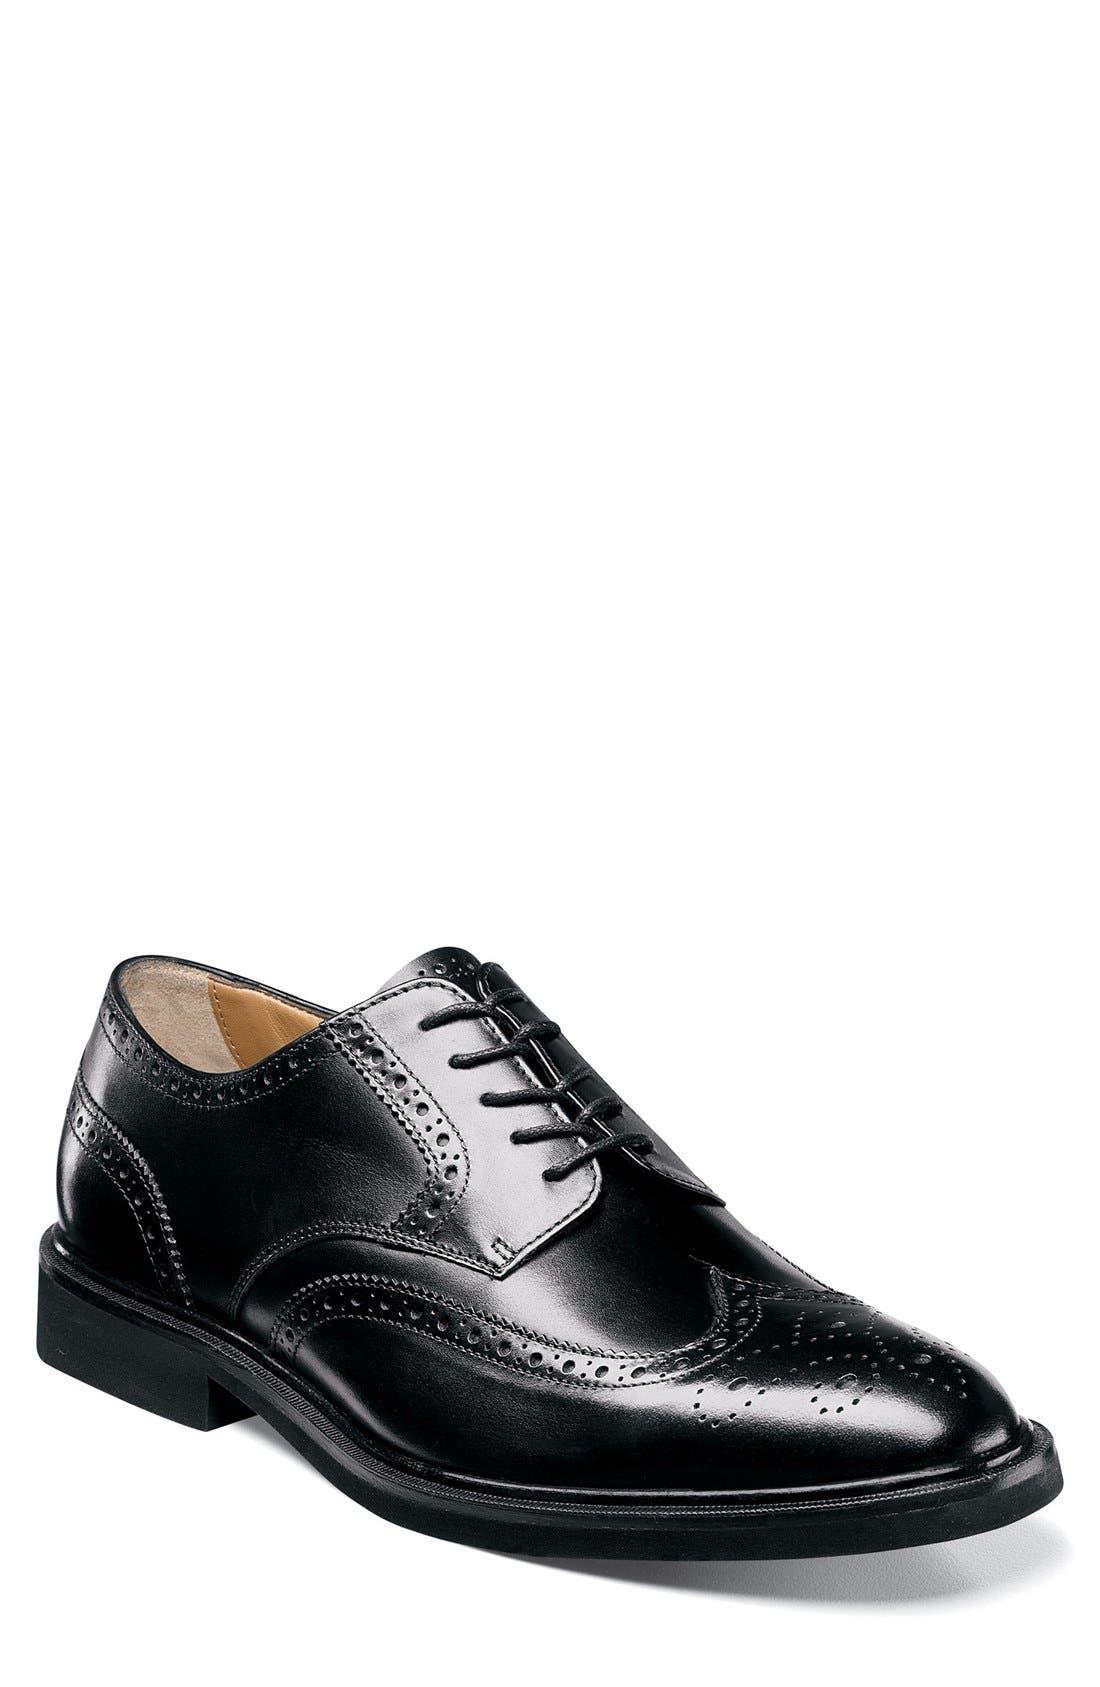 Hamilton Wingtip,                         Main,                         color, Black Leather